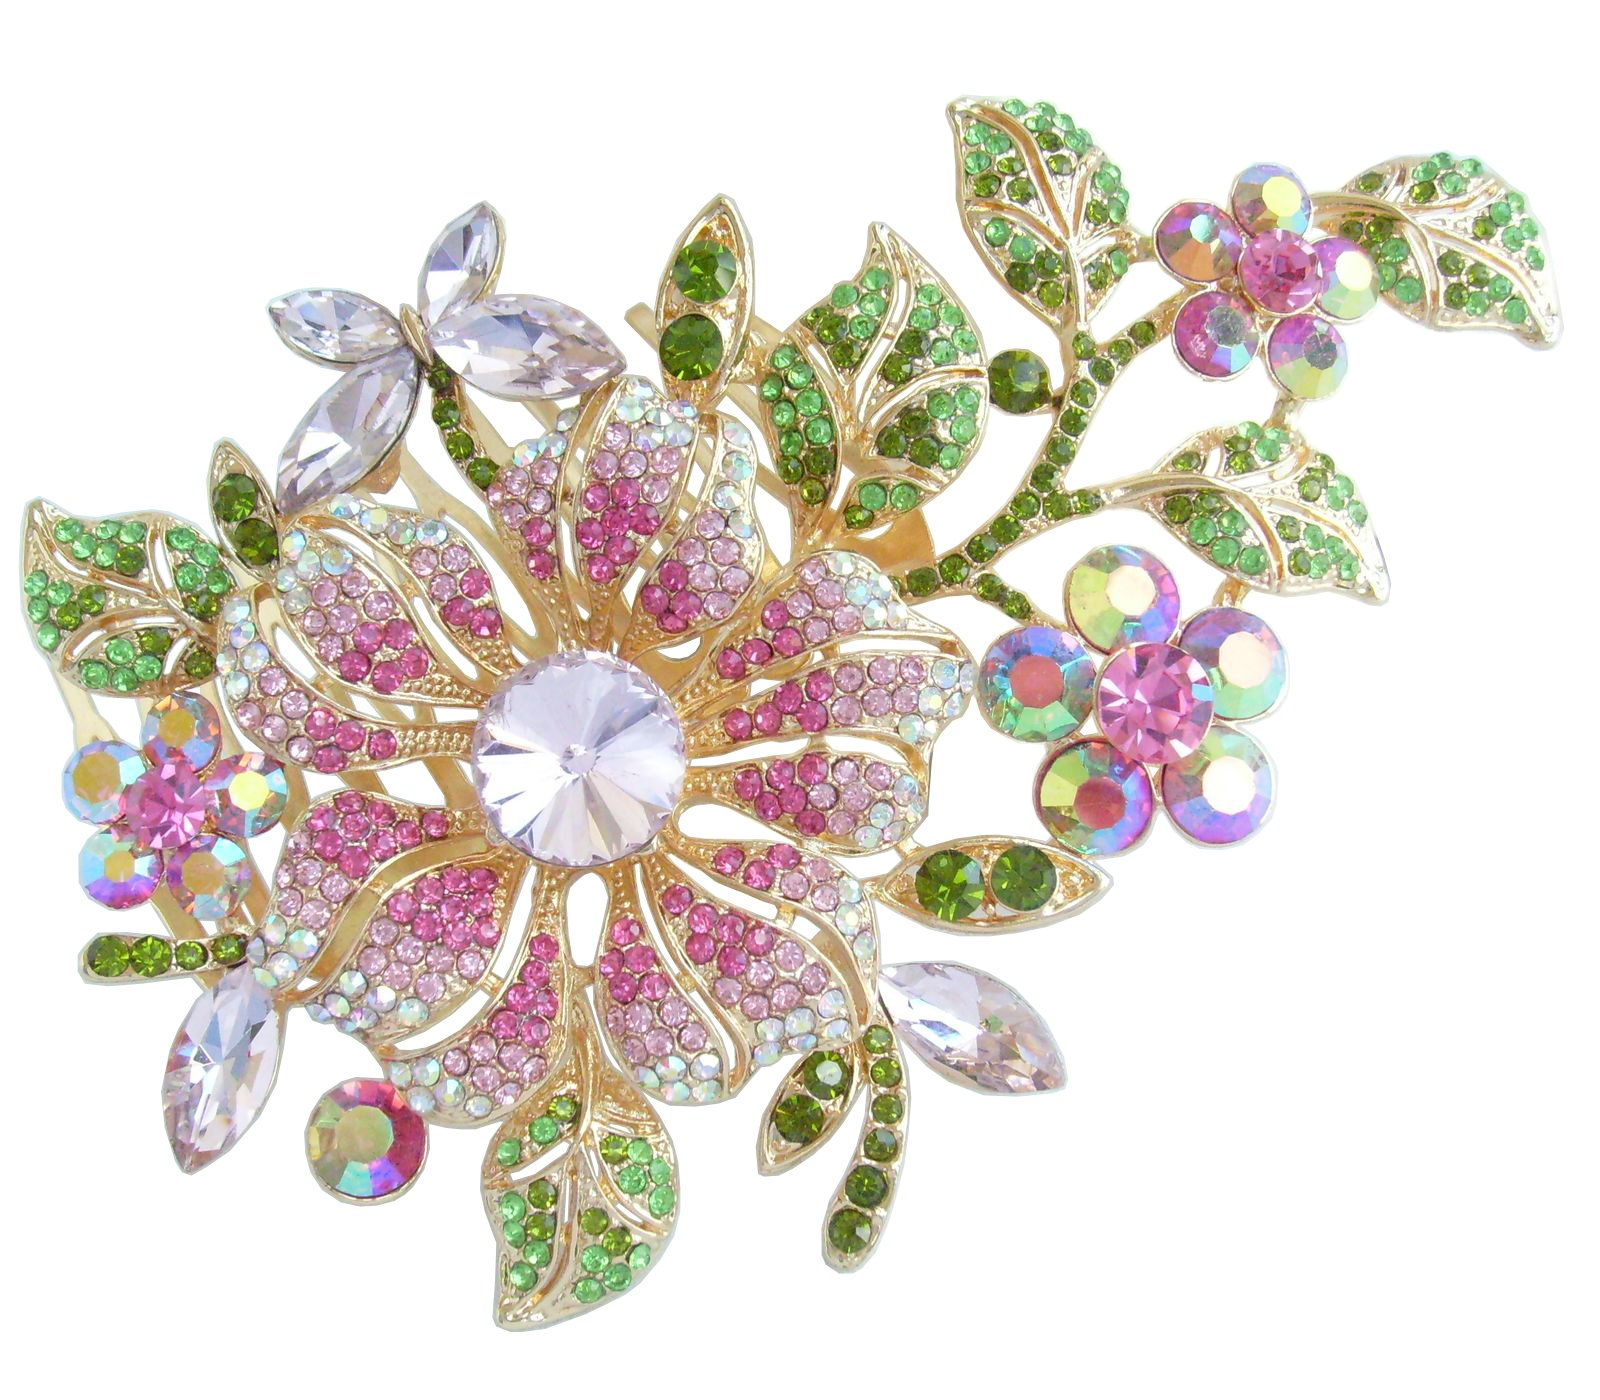 Wedding Hair Accessories-Sindary Jewelry Sindary Wedding Jewelry 4.72'' Pretty Bridal Orchid Flower Hair Comb Rhinestone Crystal HZ4712 (Gold-Tone Pink)